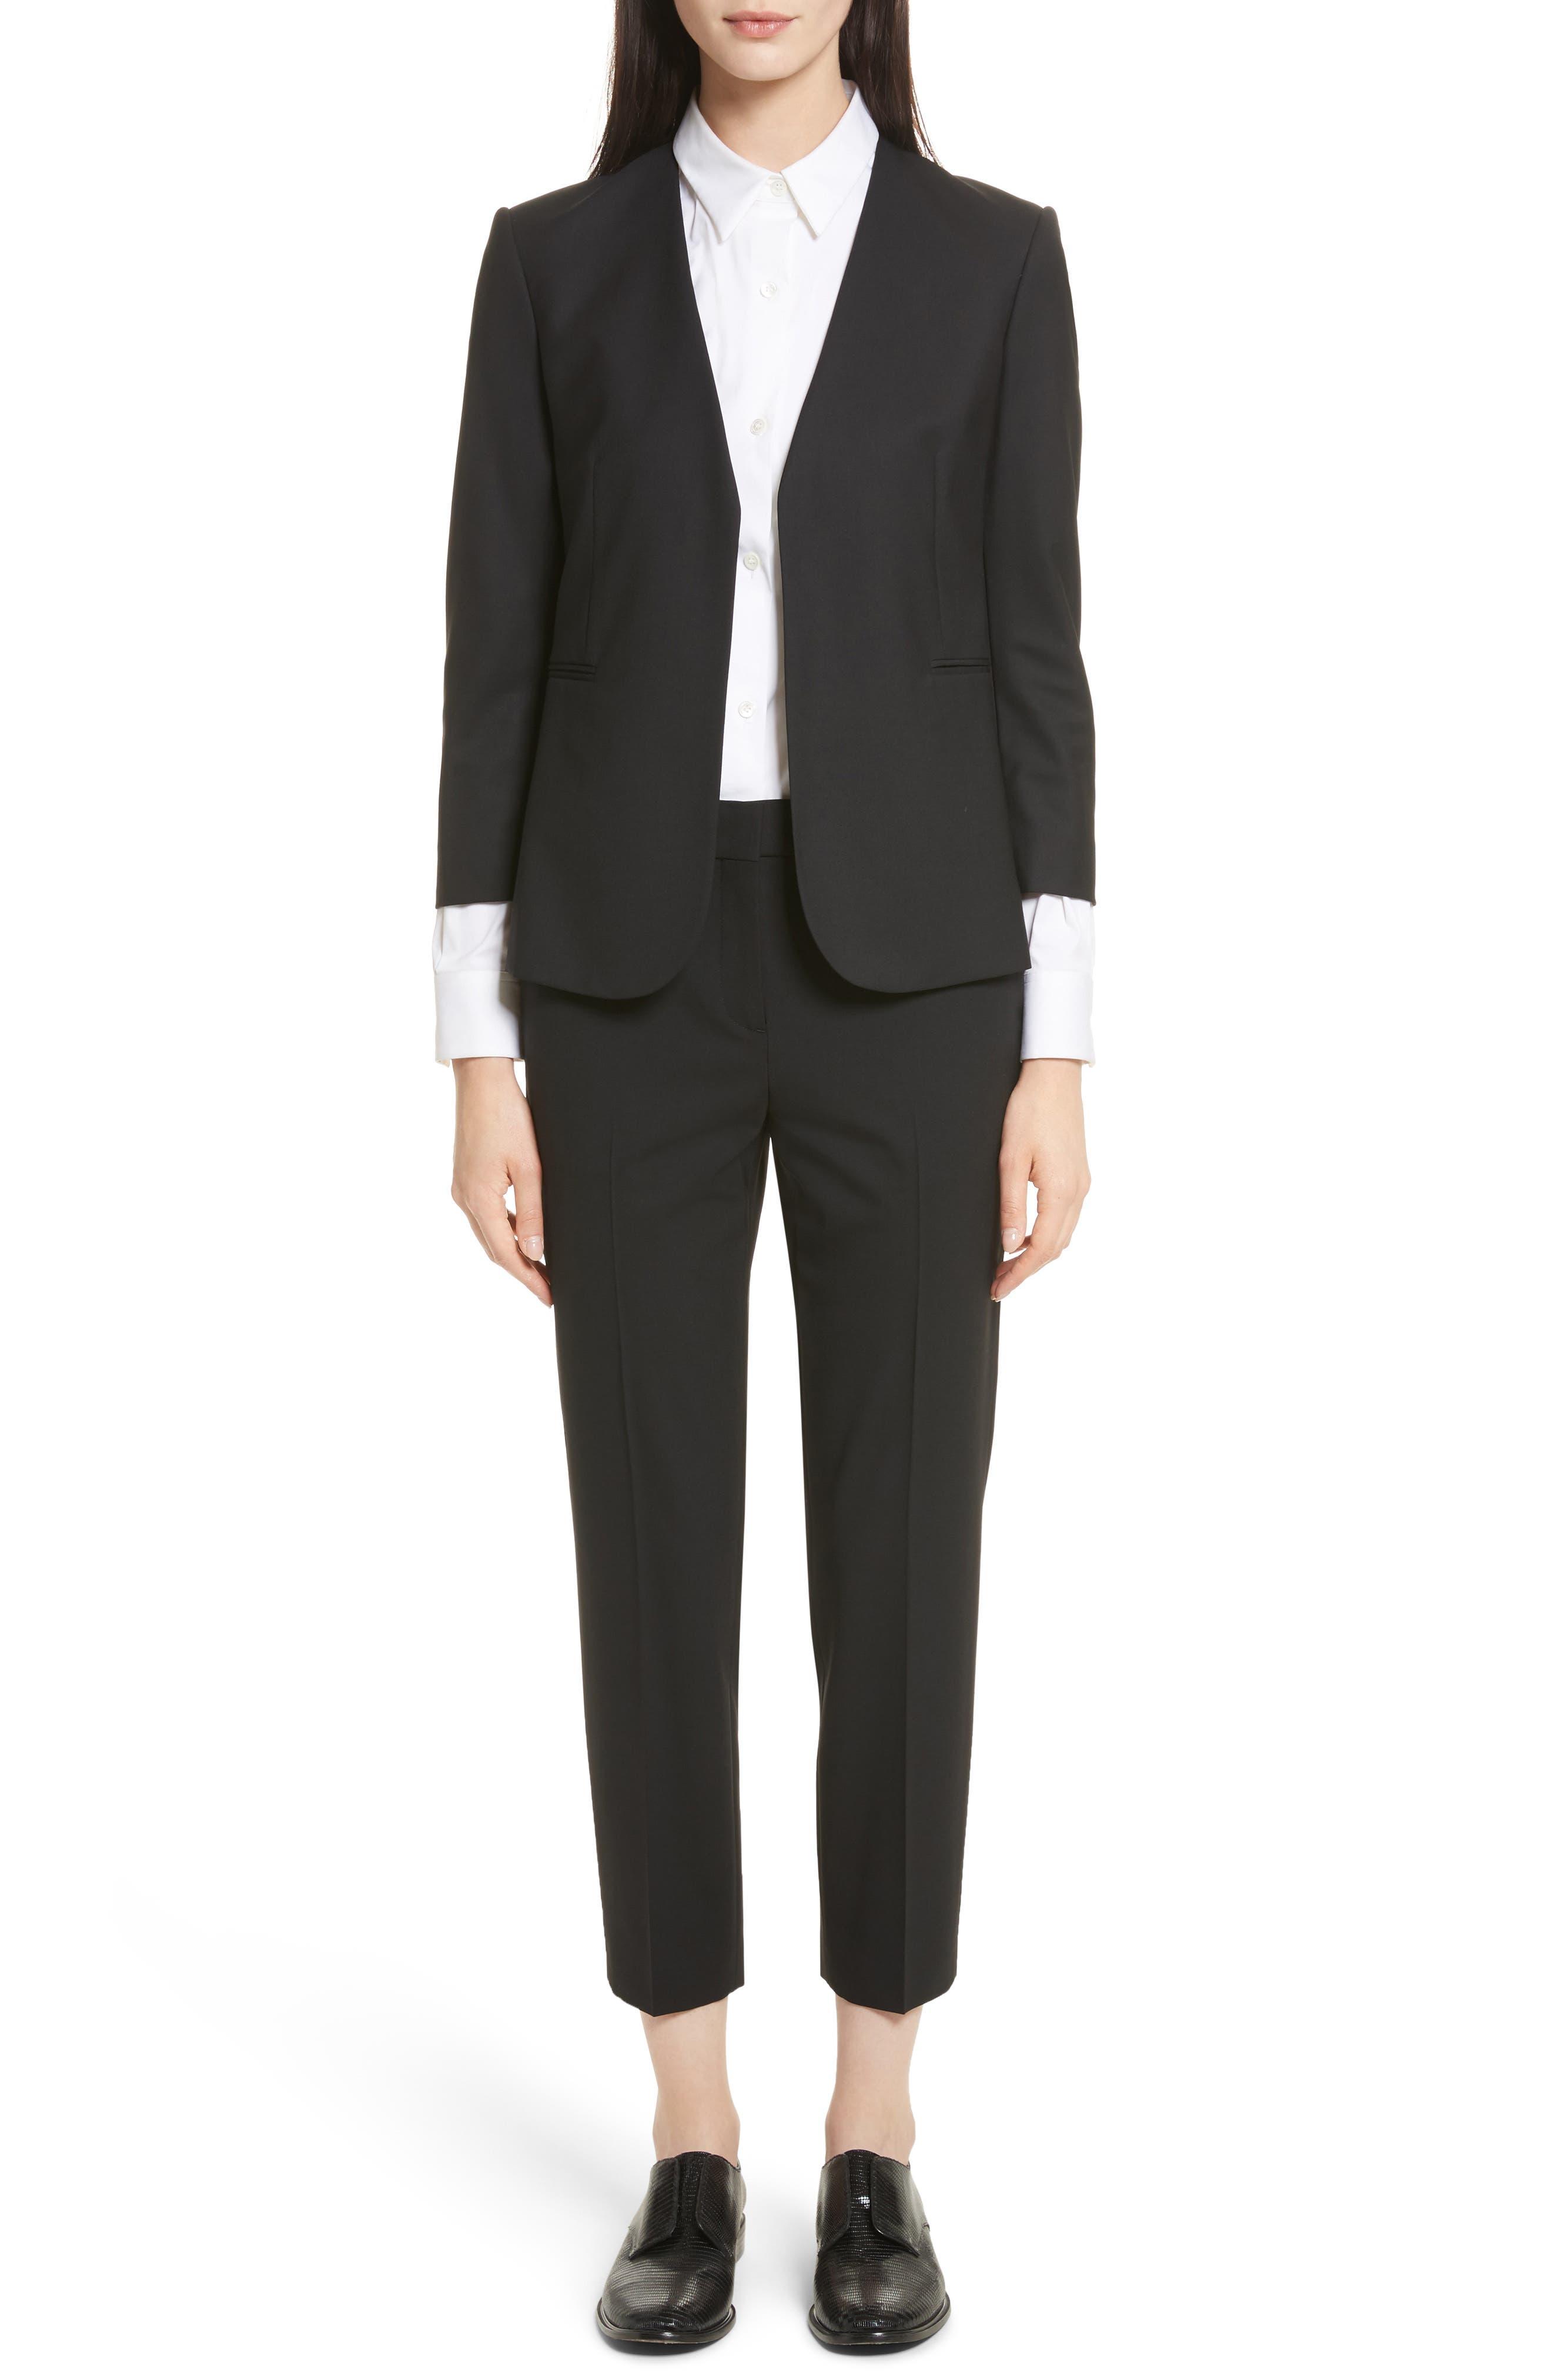 THEORY, Treeca 2 Good Wool Crop Suit Pants, Alternate thumbnail 8, color, BLACK